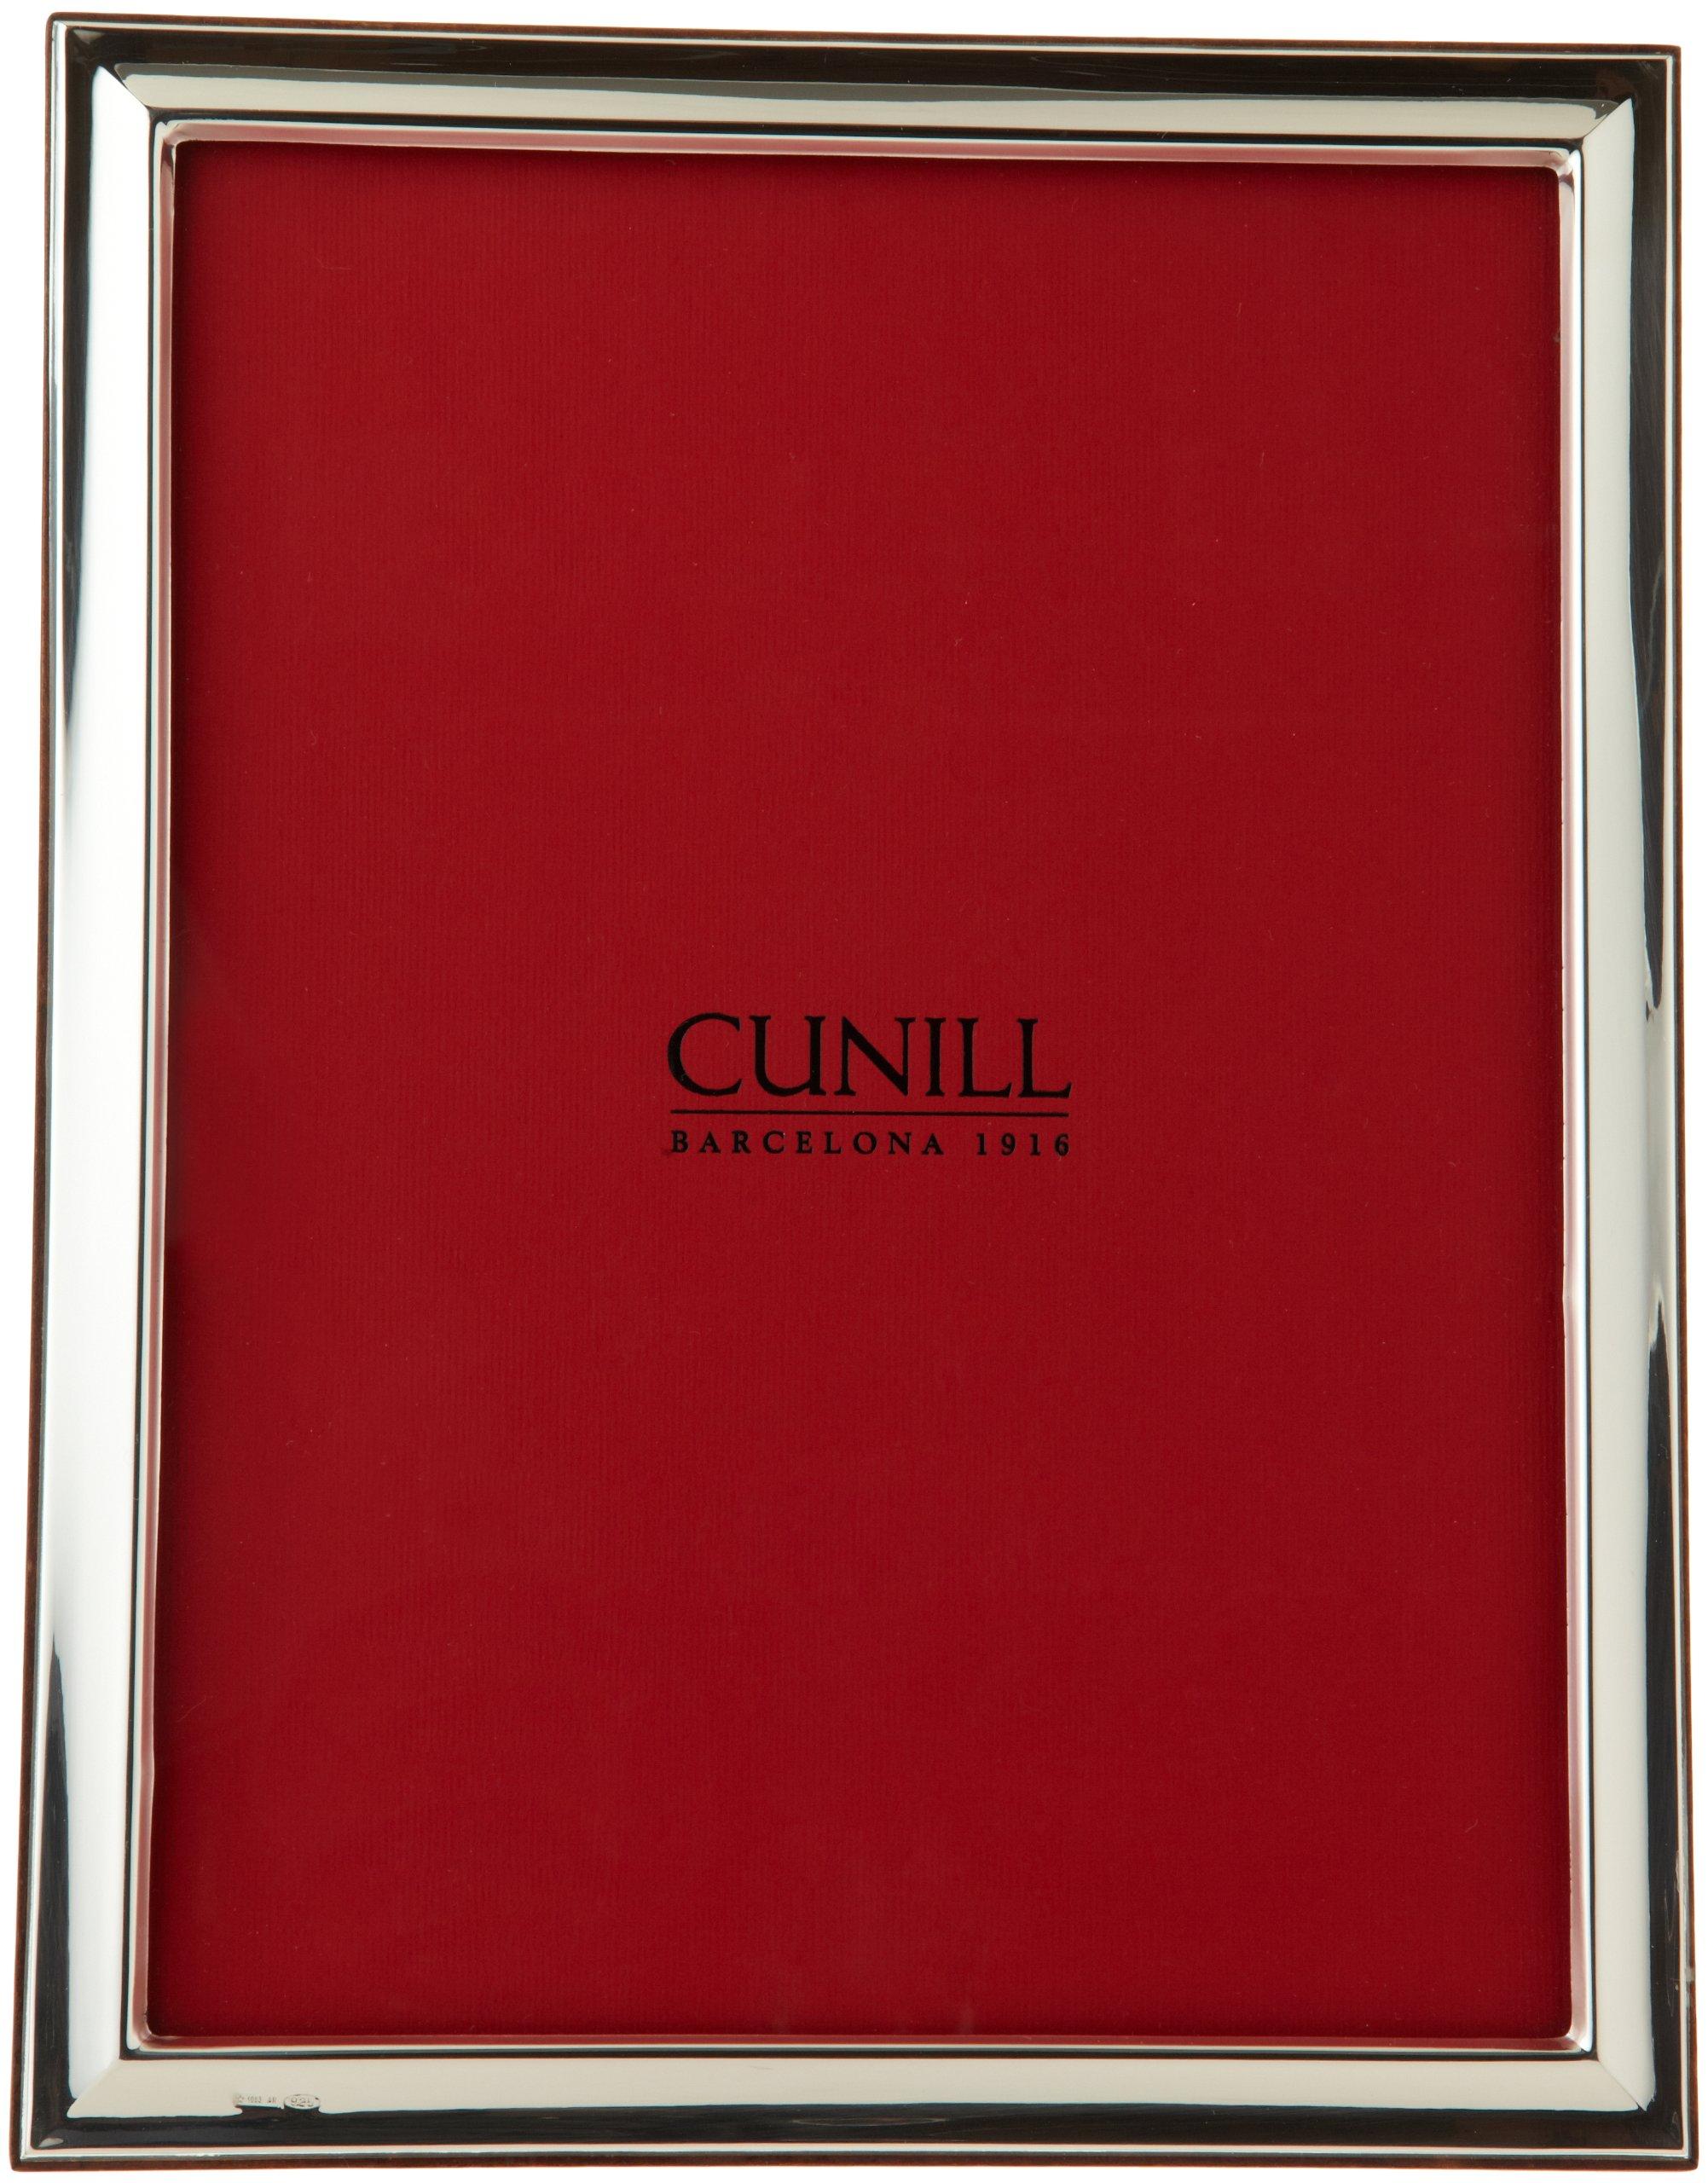 Cunill Barcelona Plain Beveled Sterling Silver Frame, 8'' x 10''